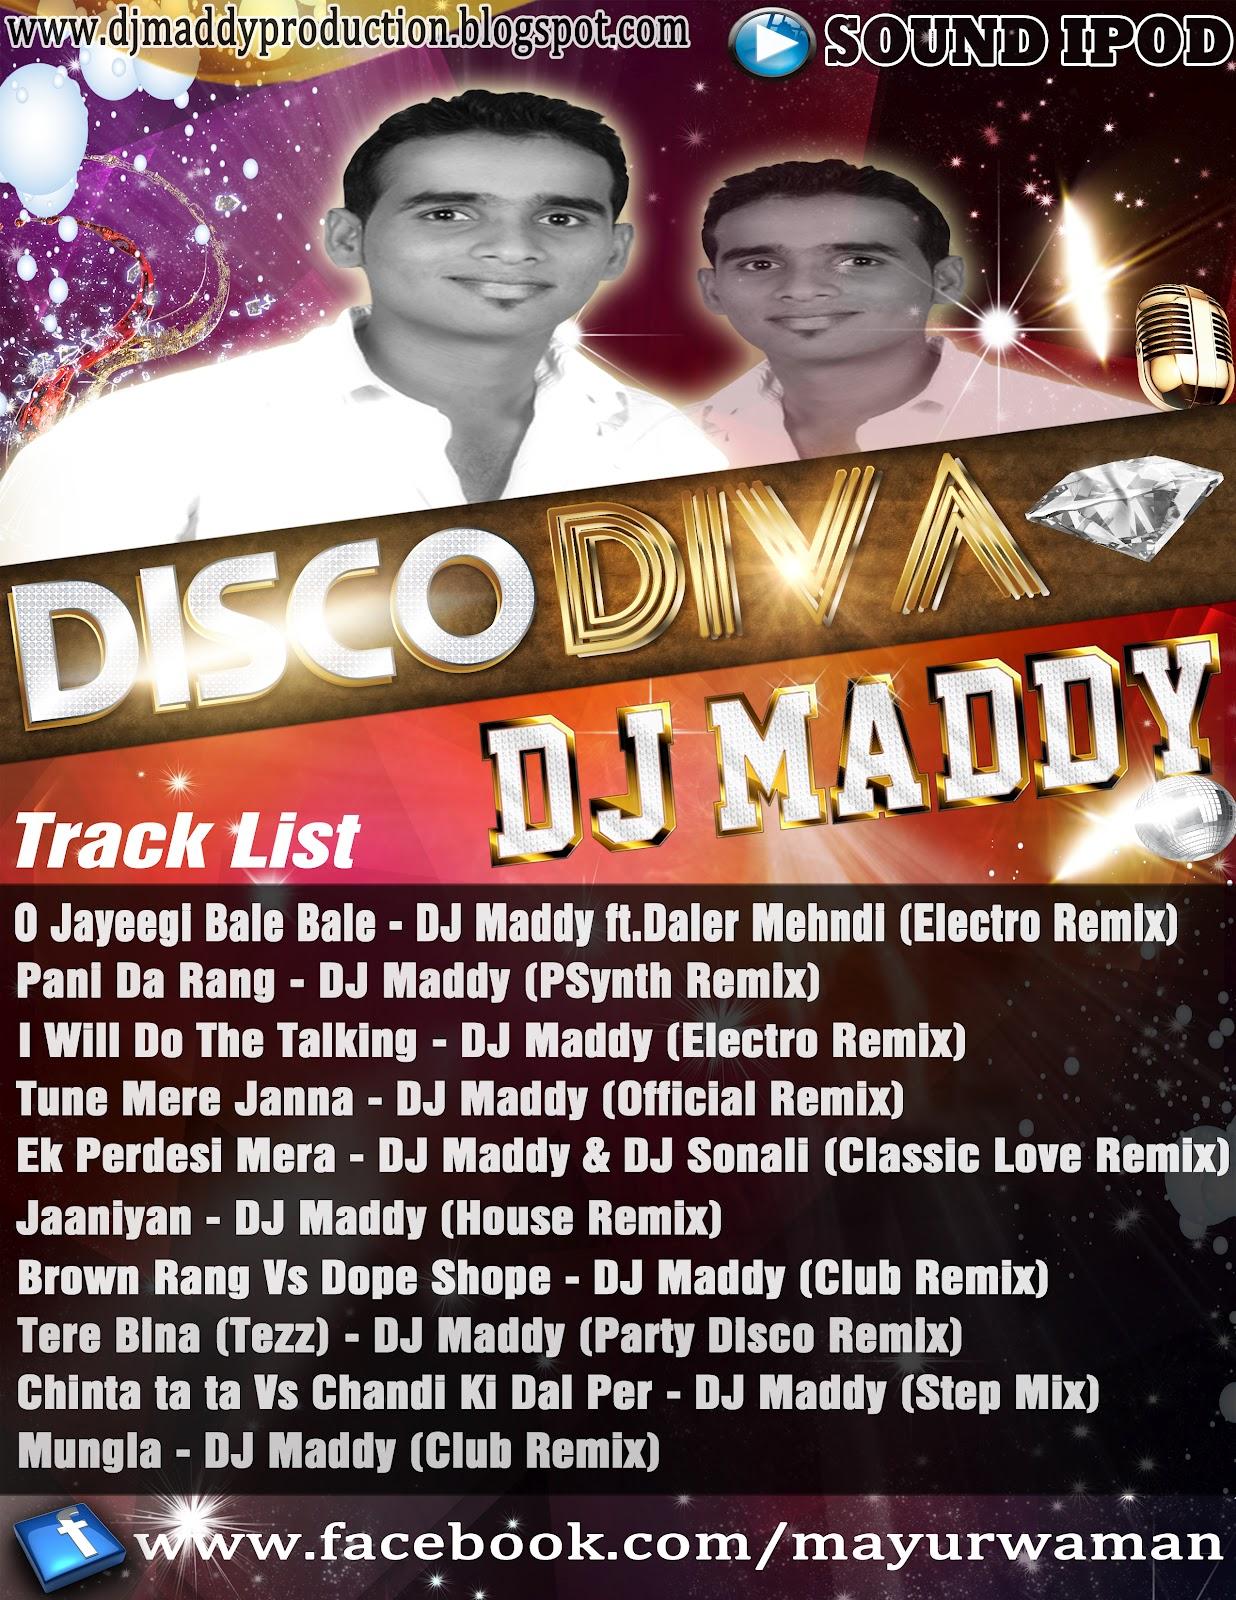 payal naman dj mp3 song free download